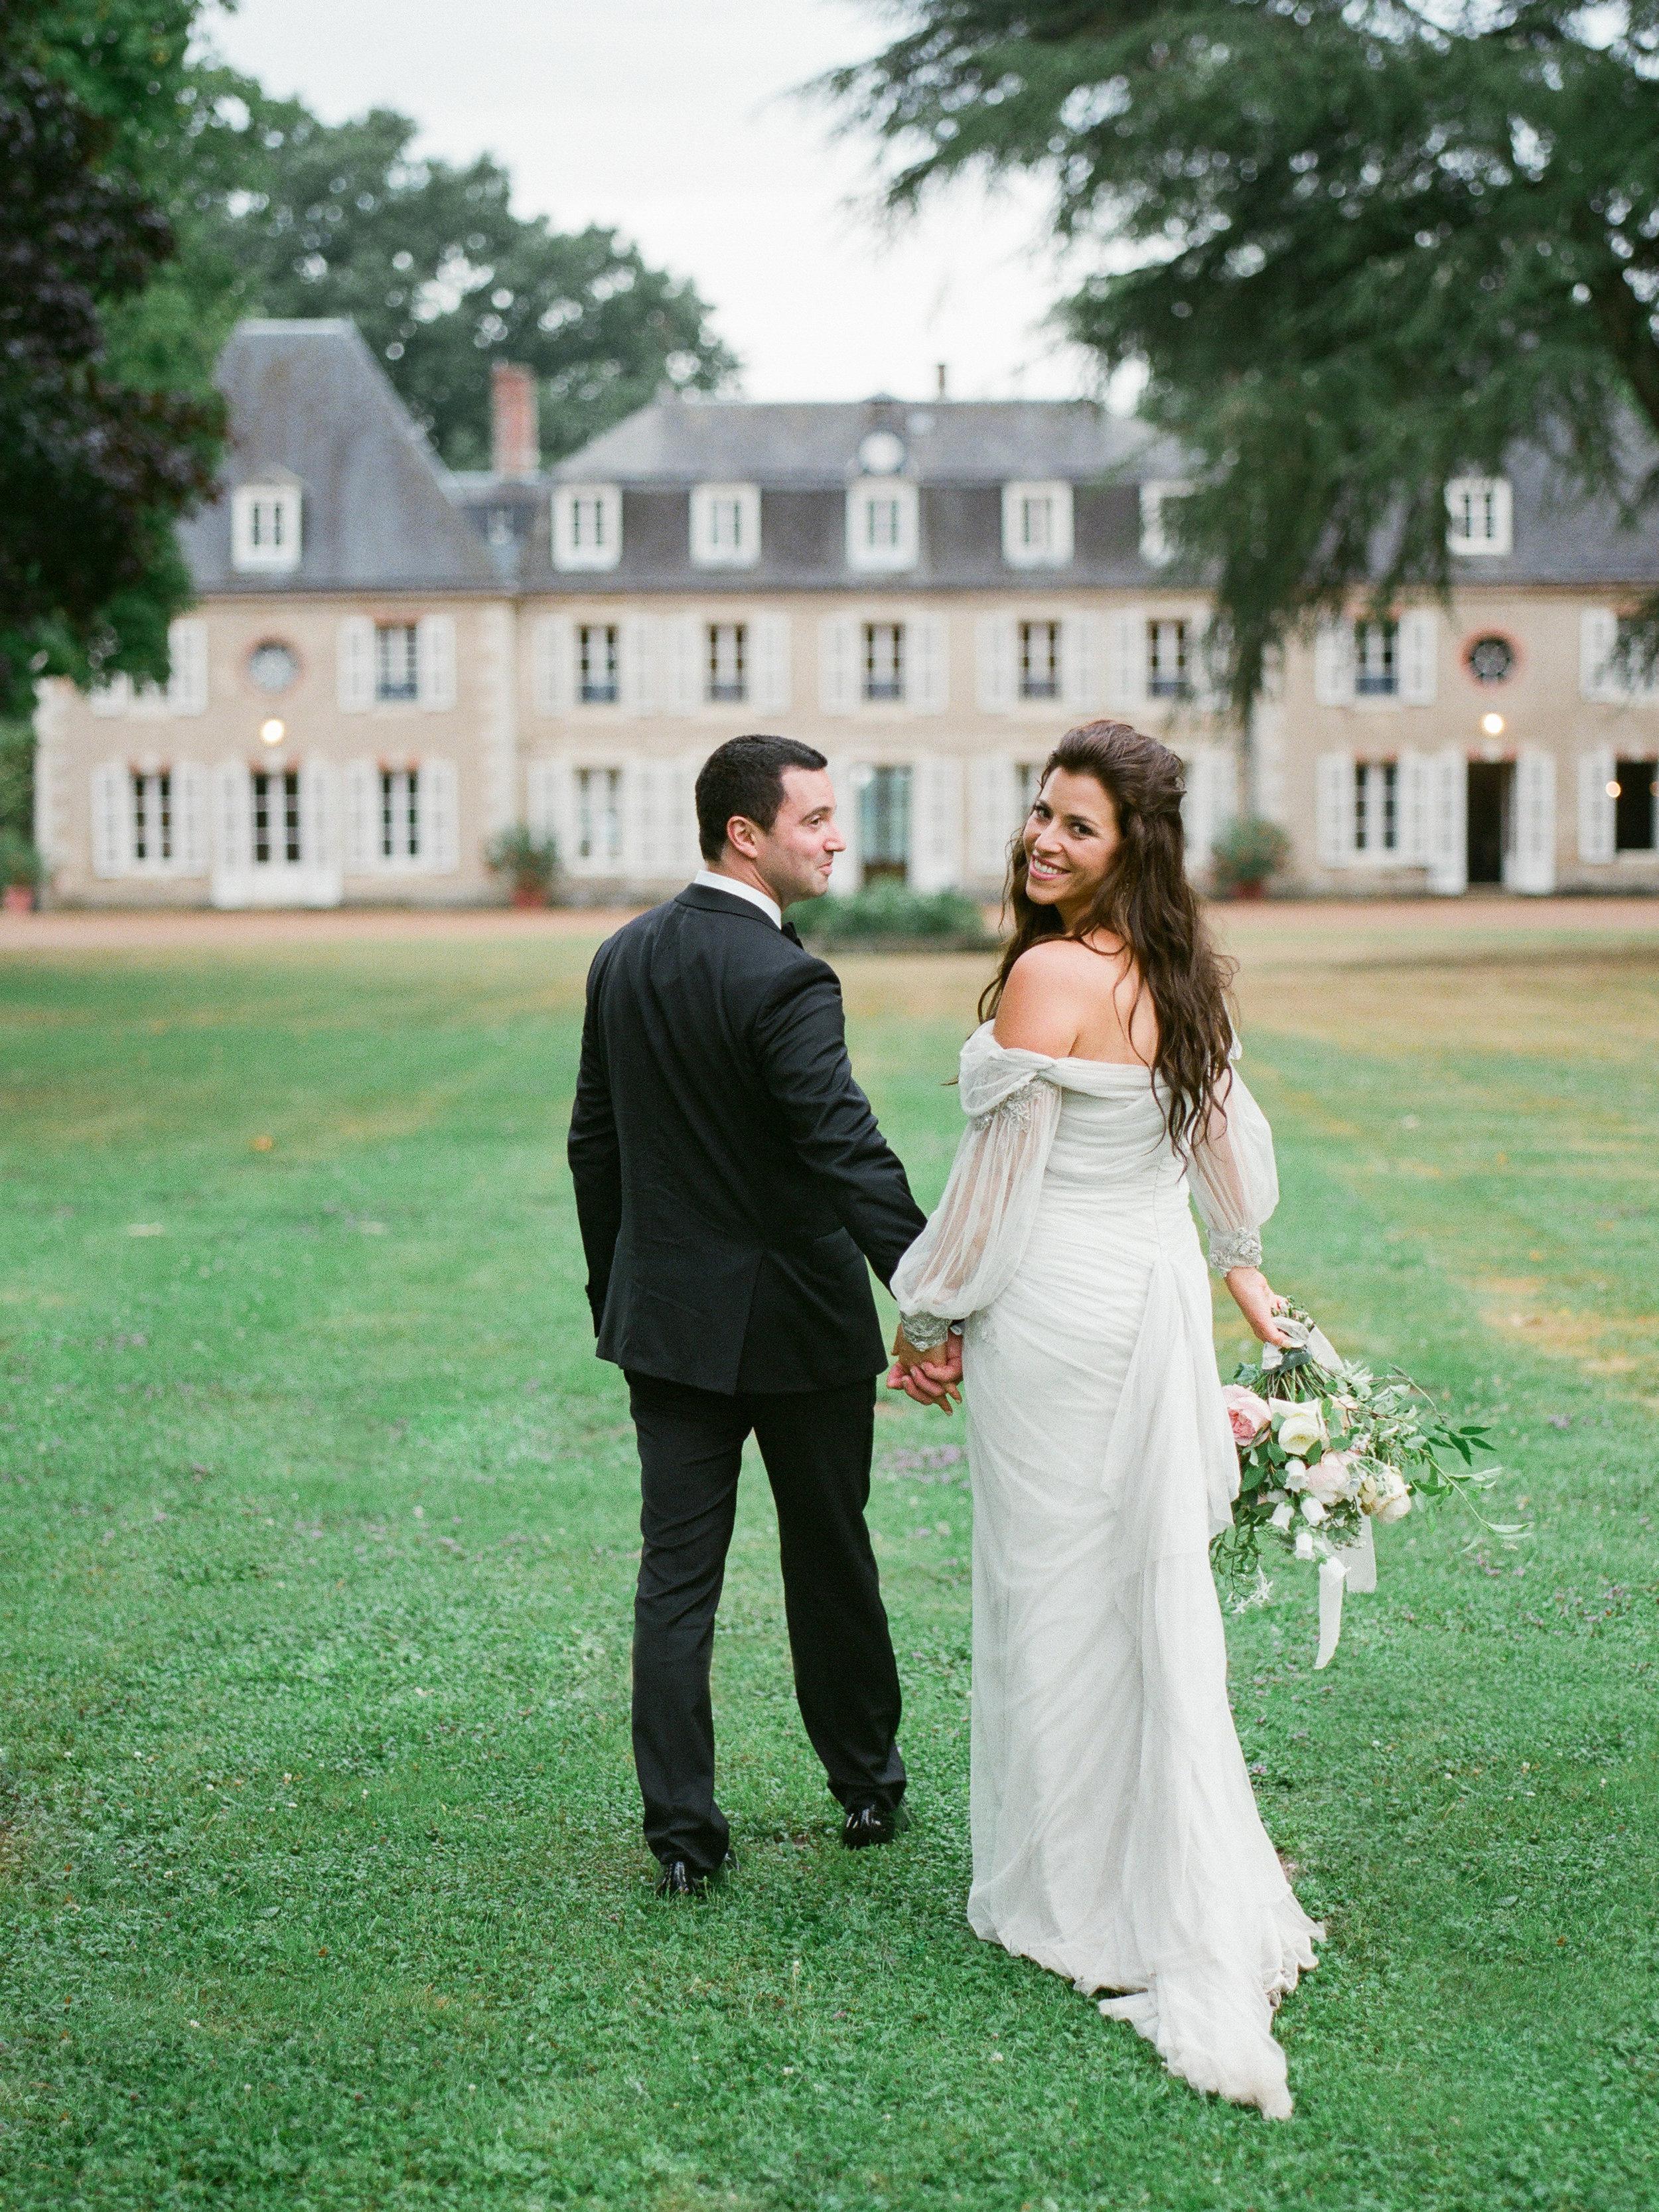 fine art wedding florist, foraged floral, chateau bouthonvilliers wedding florist in paris france wedding.jpg